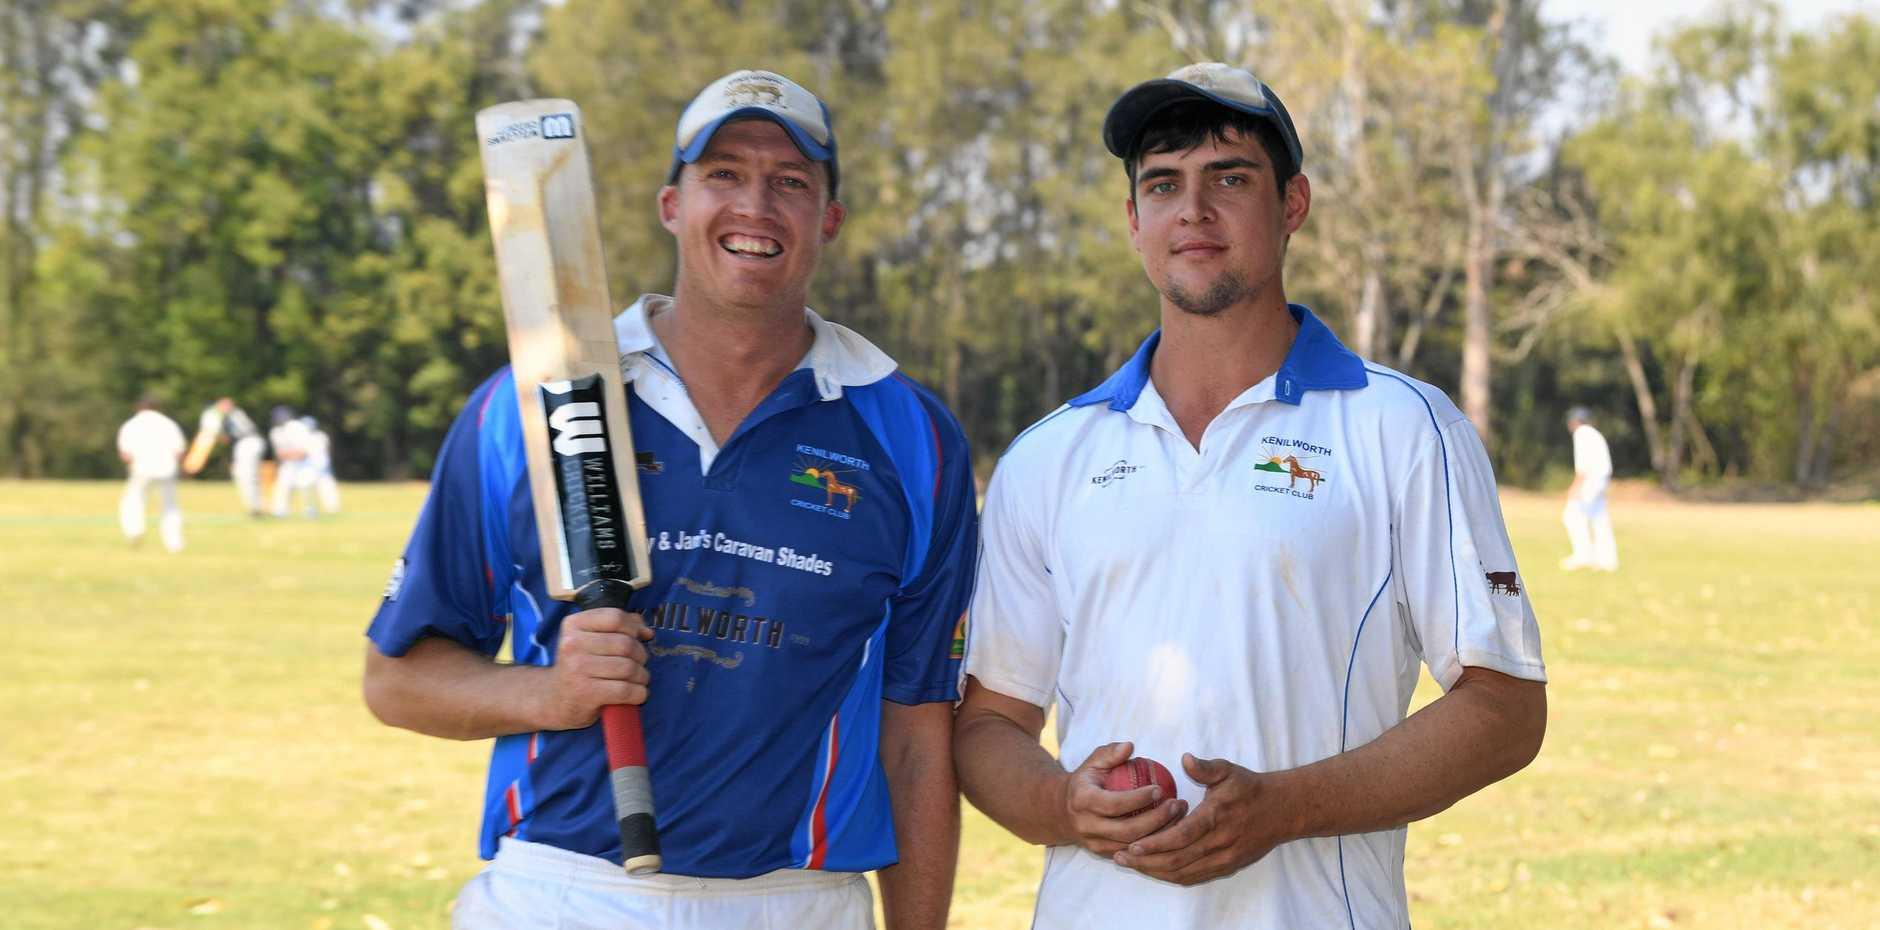 Gympie Cricket - Kelvin Cochrane and Tyron Blinco